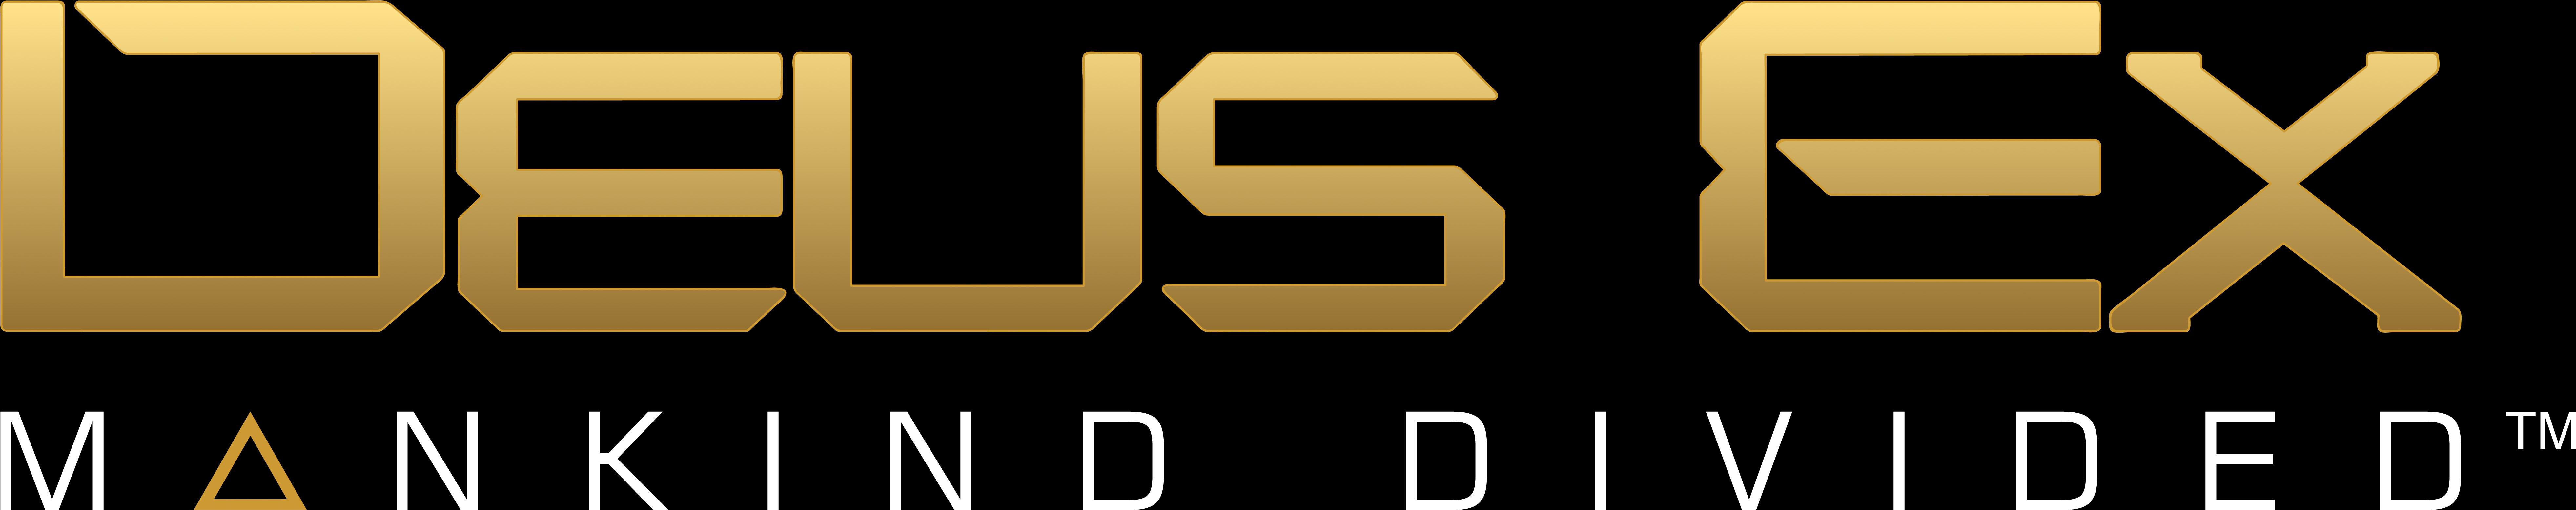 Deus Ex Mankind Divided Logo